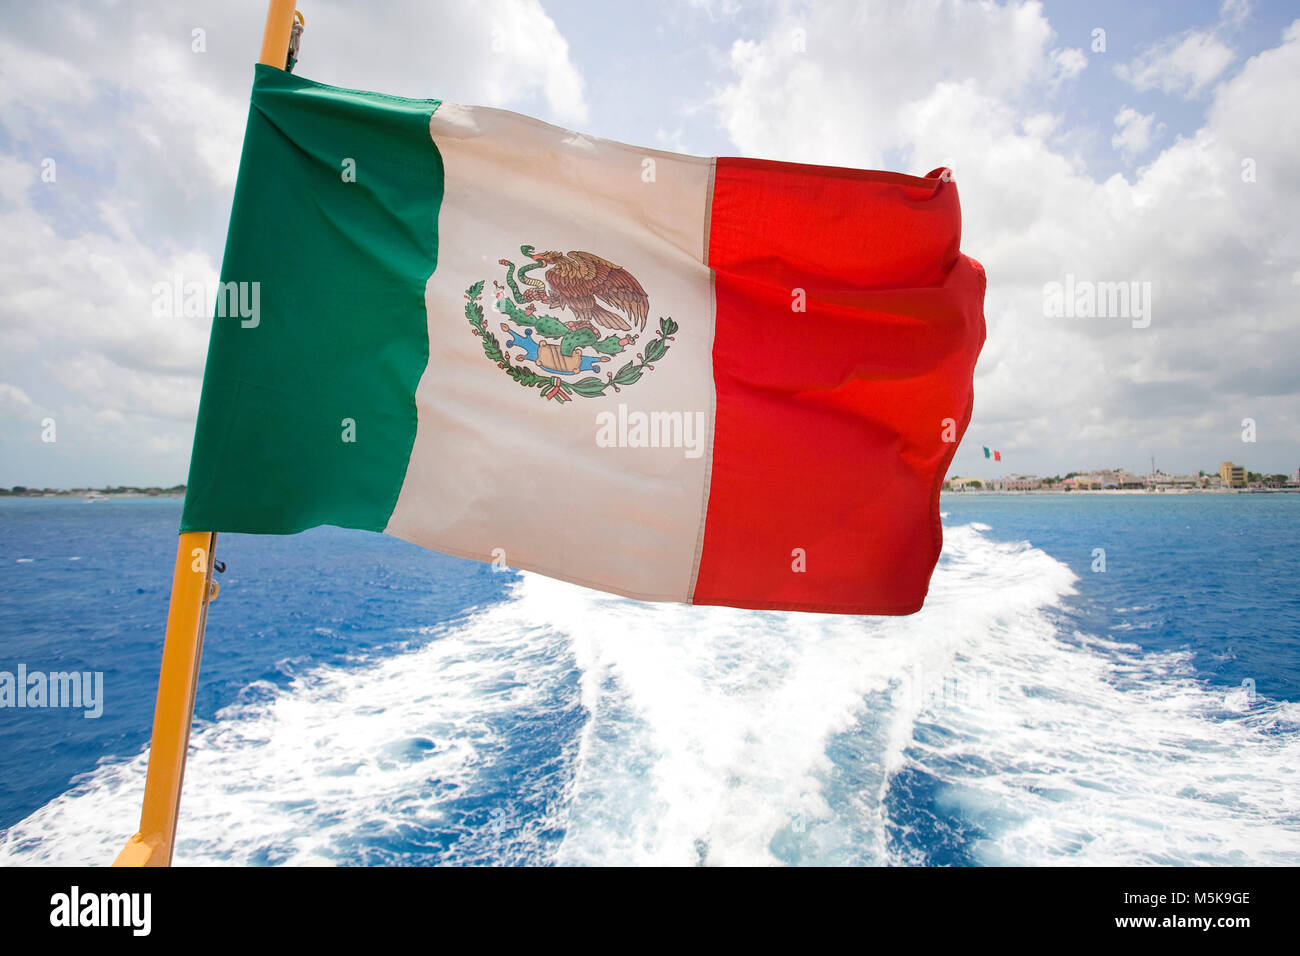 Bootsfahrt, mexikanische Nationalflagge am Heck, Cozumel, Mexiko, Karibik   Boat trip, mexican national flag at - Stock Image